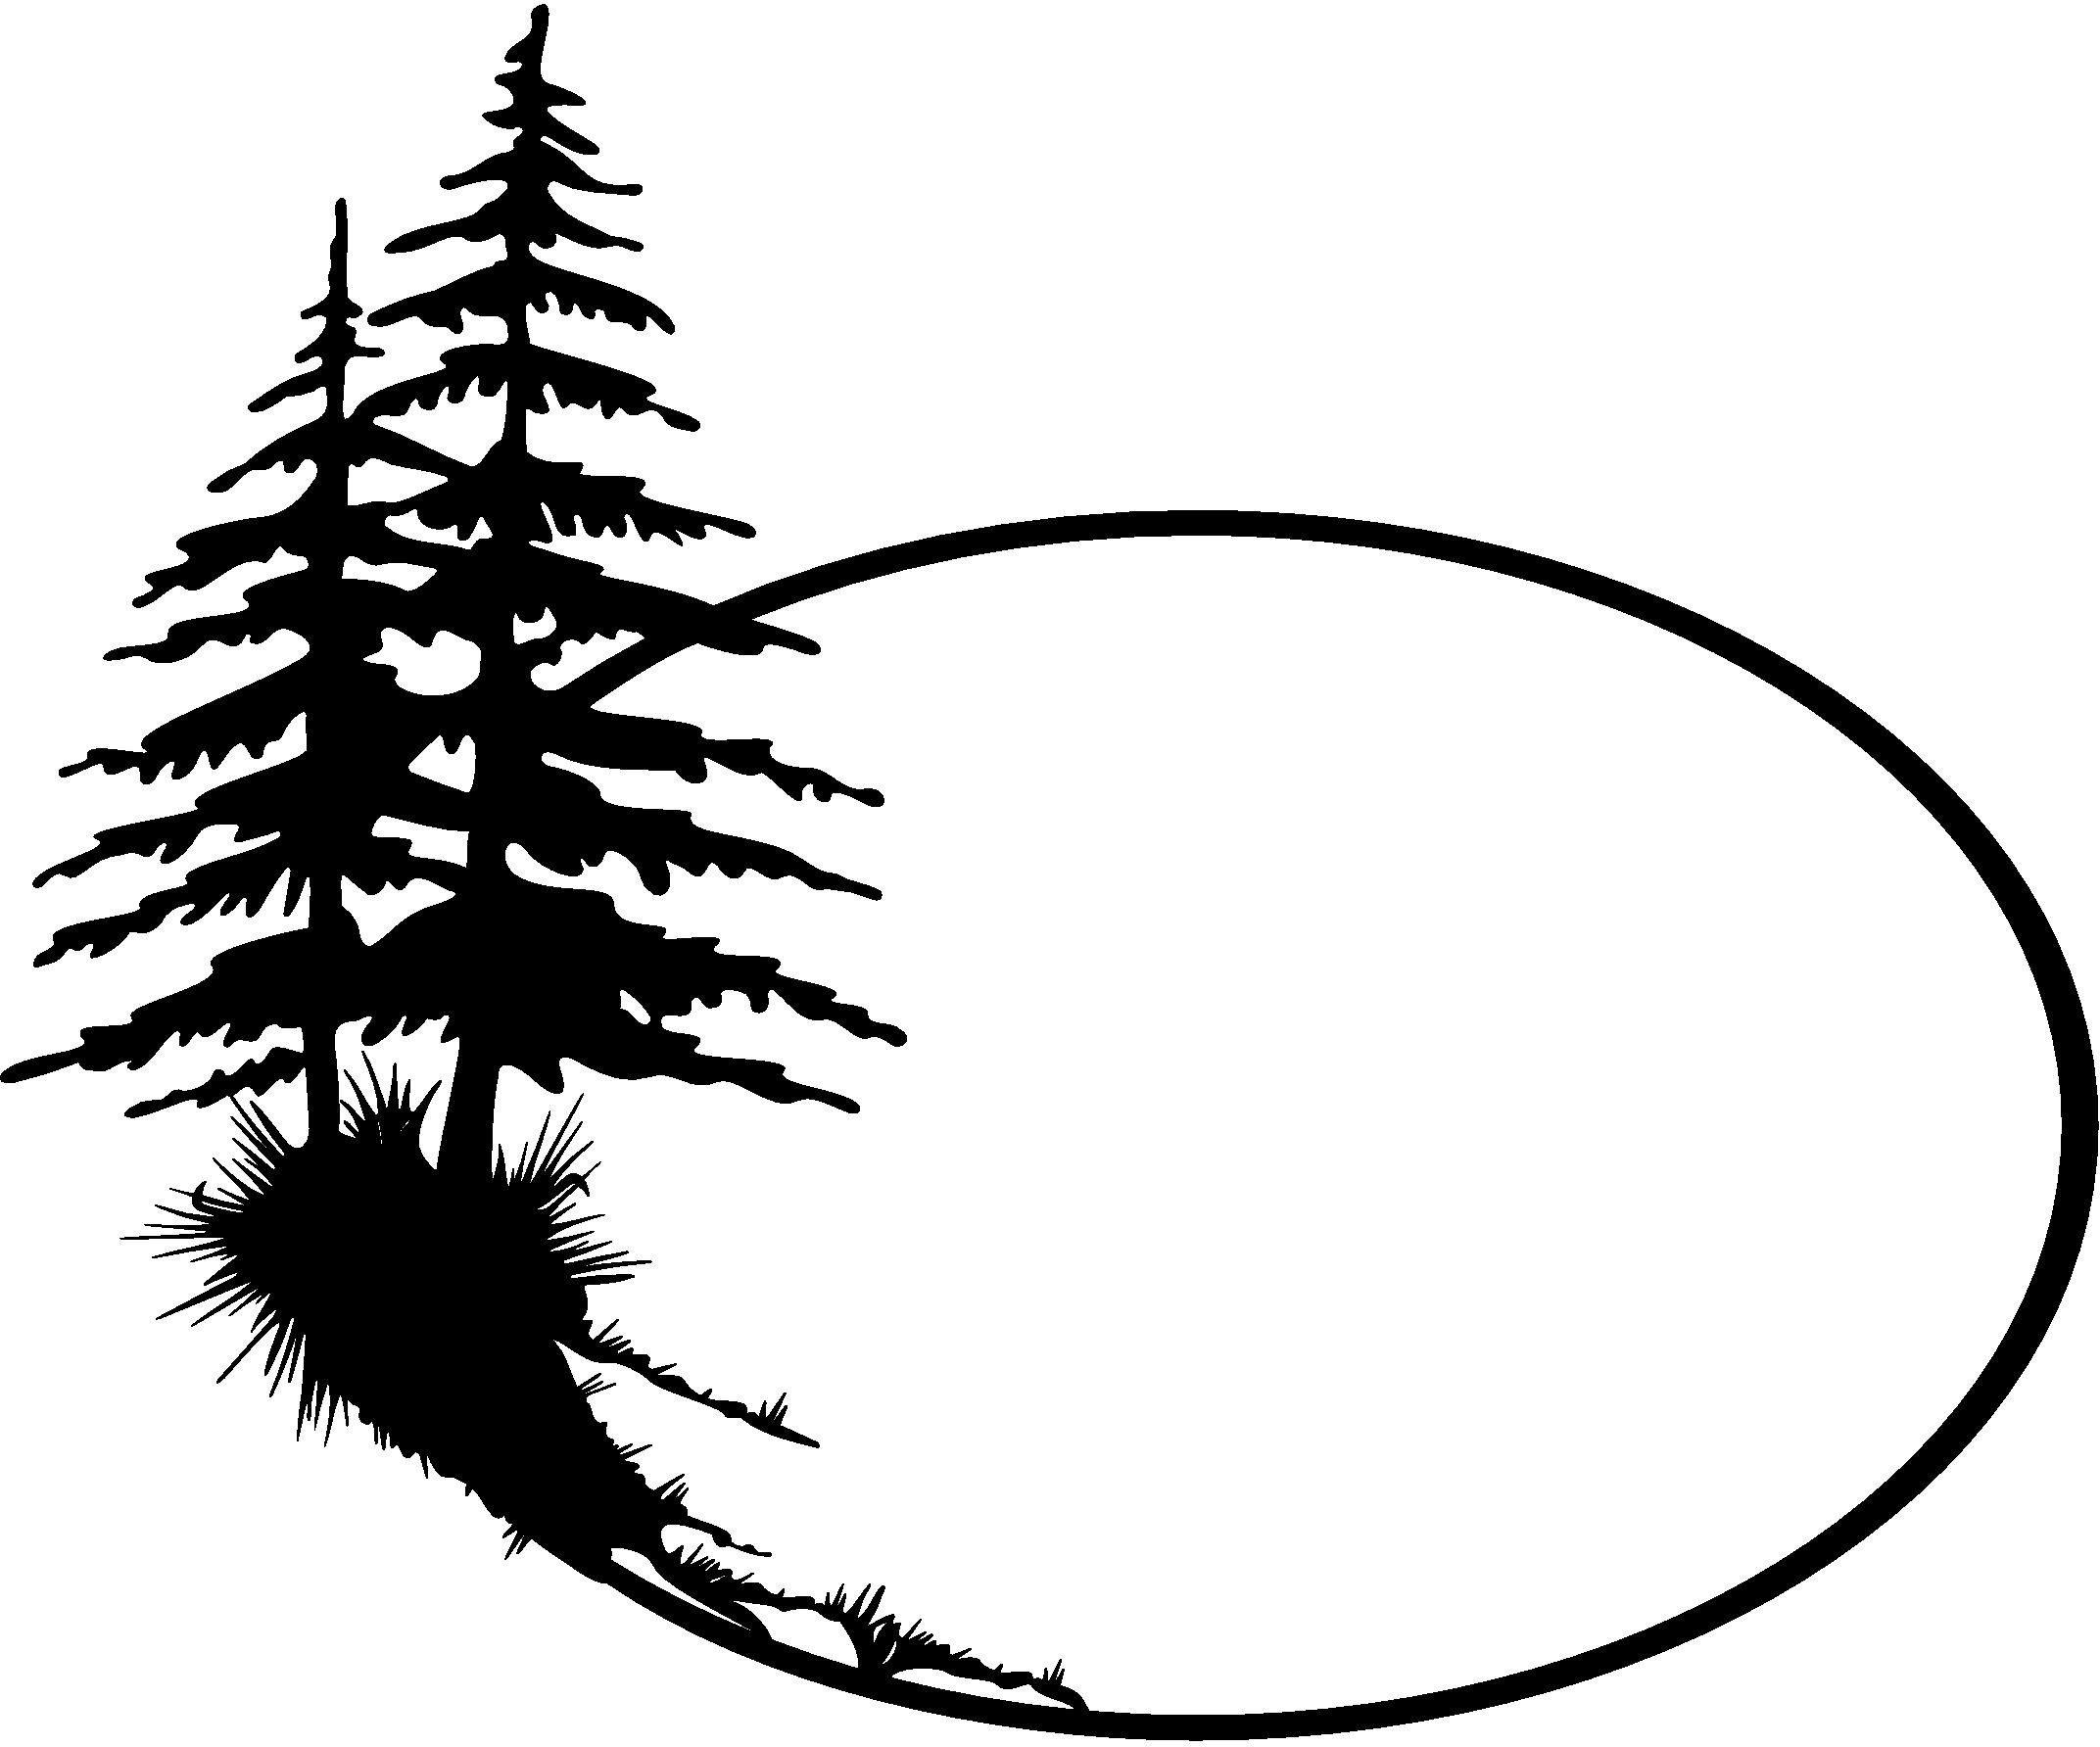 medium resolution of pine tree silhouette clip art clipart pine